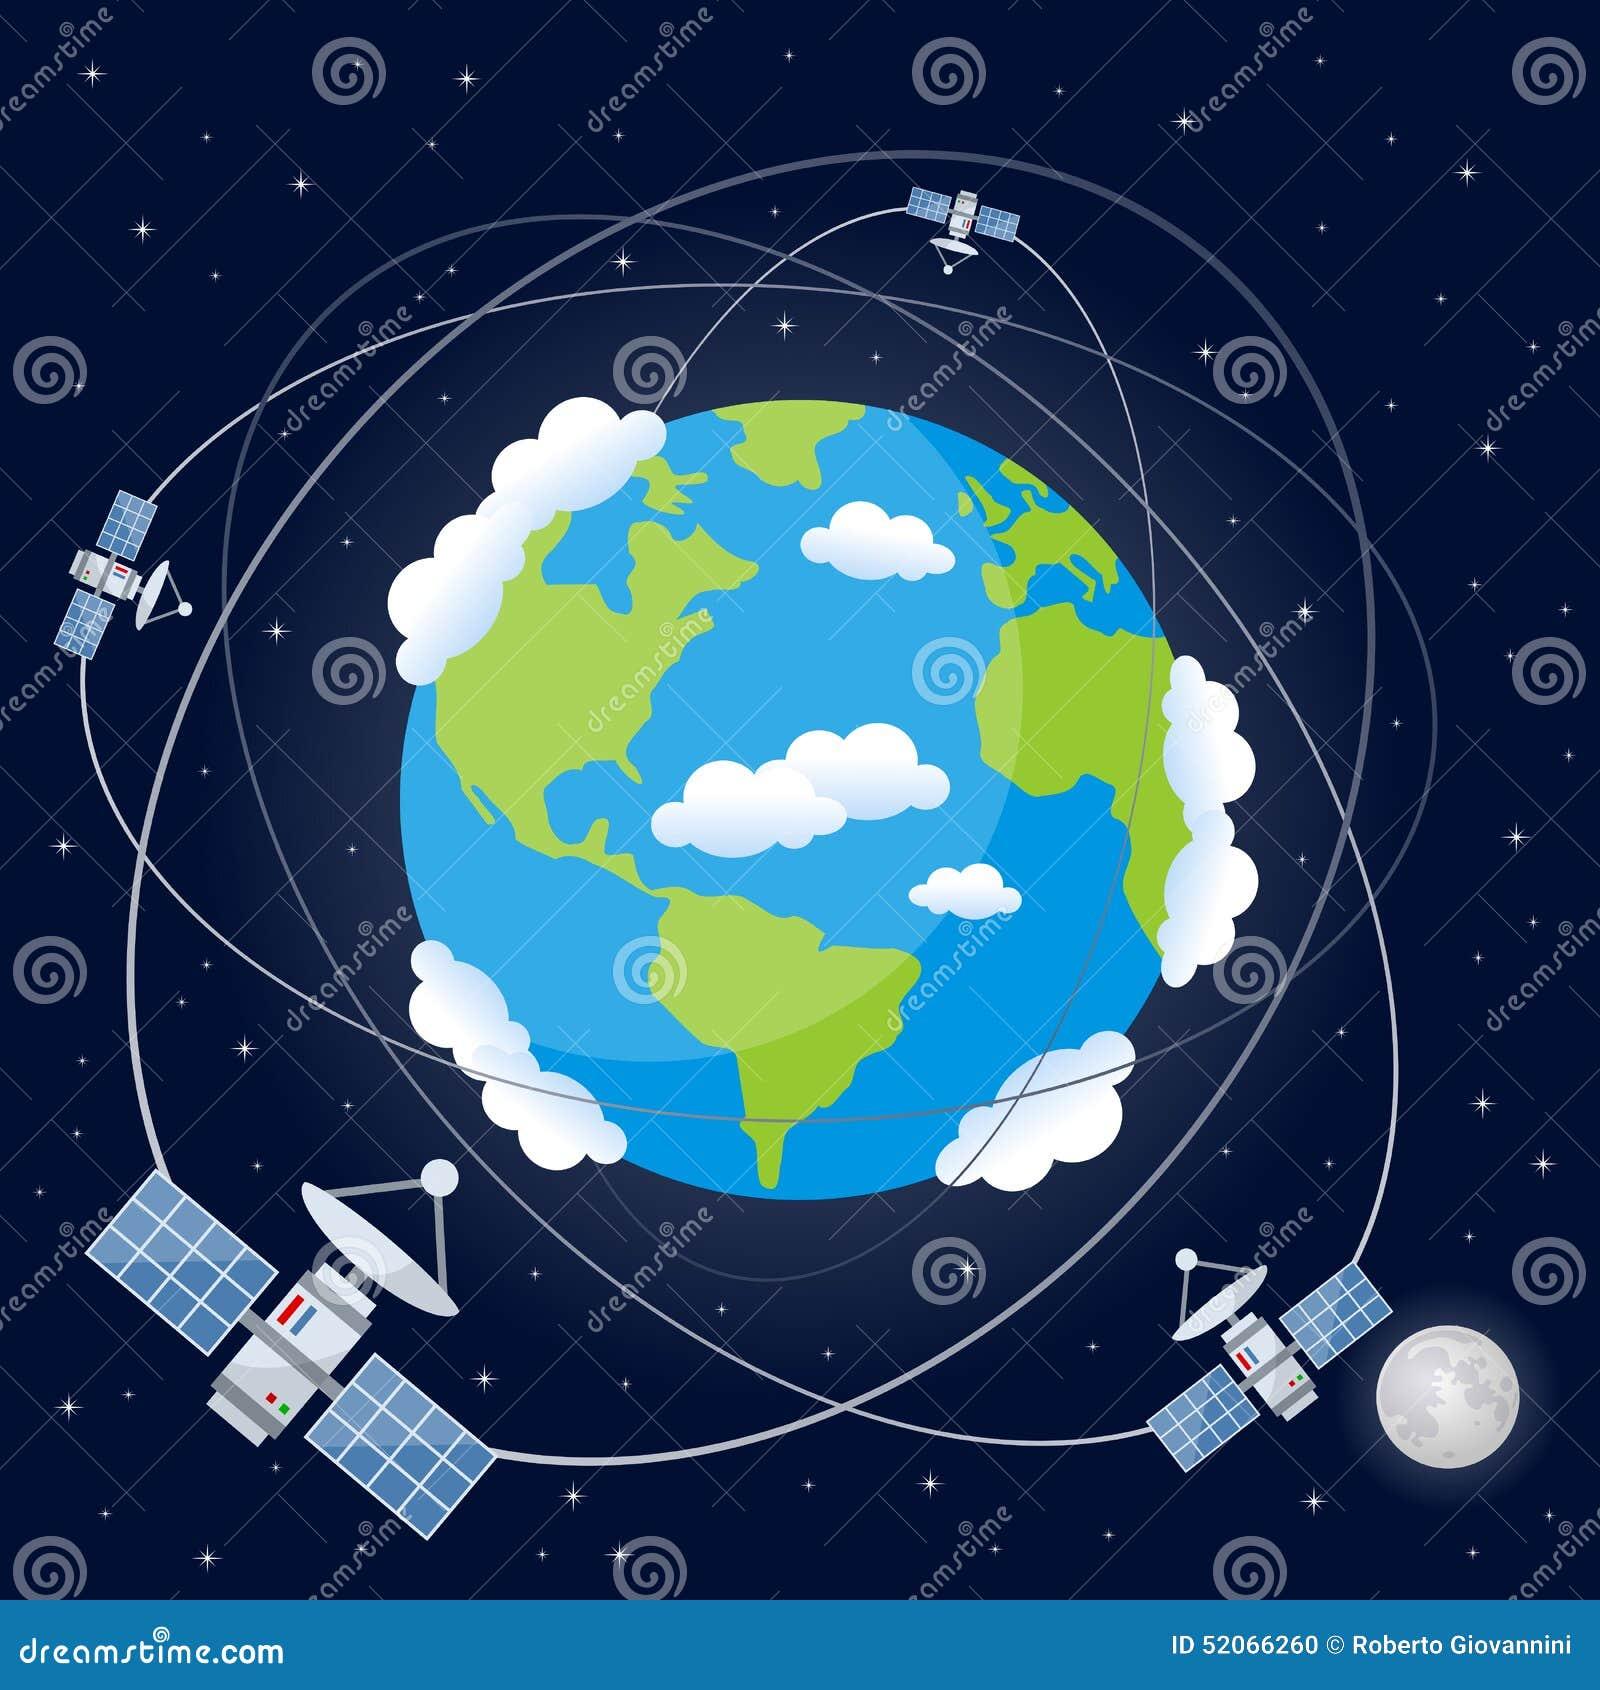 Cartoon Satellites Orbiting The Earth Stock Vector Image